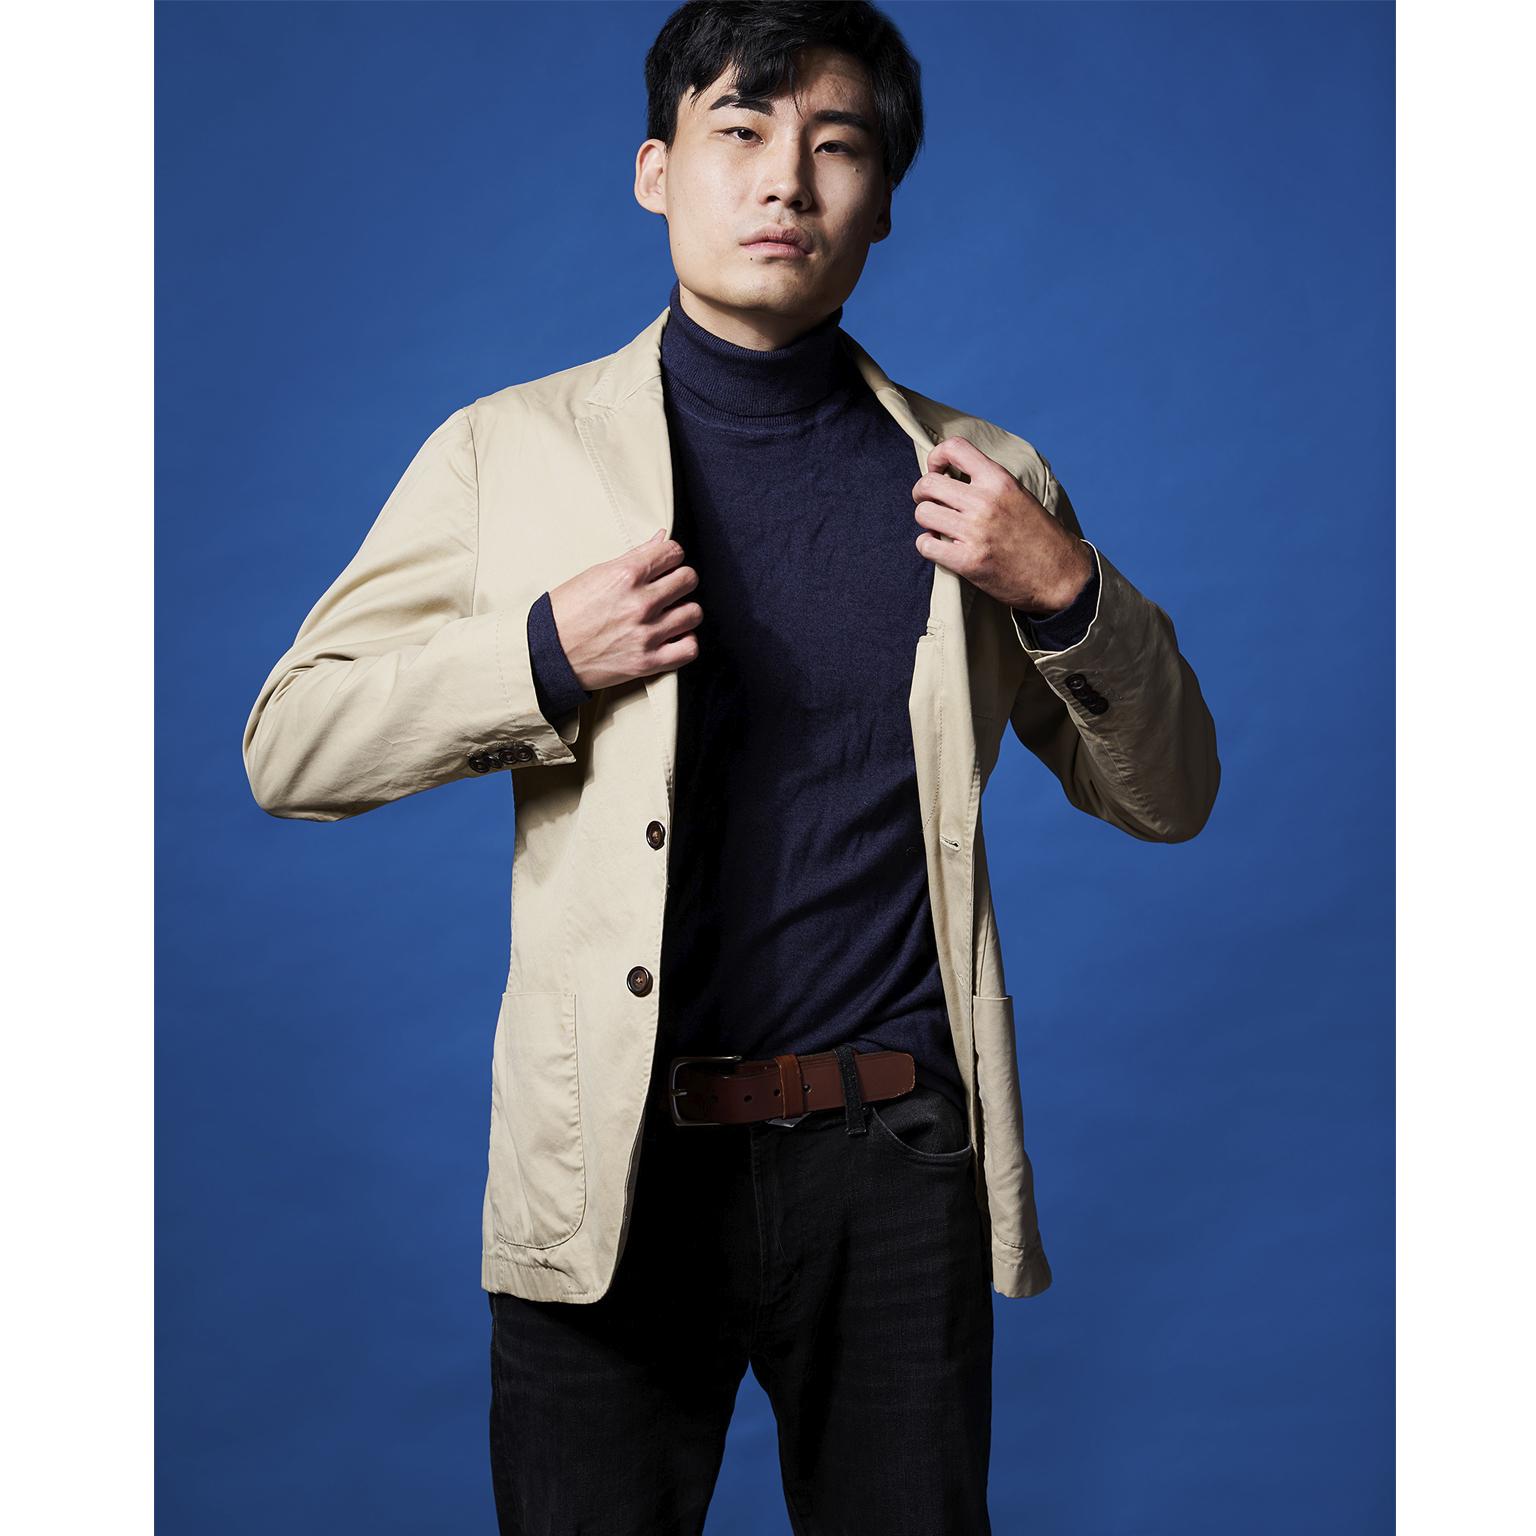 Toronto-Fitness-Model-Agency-Fitness-Casual-Commercial-Junhyuk-Ko-Fashion-Portrait-2